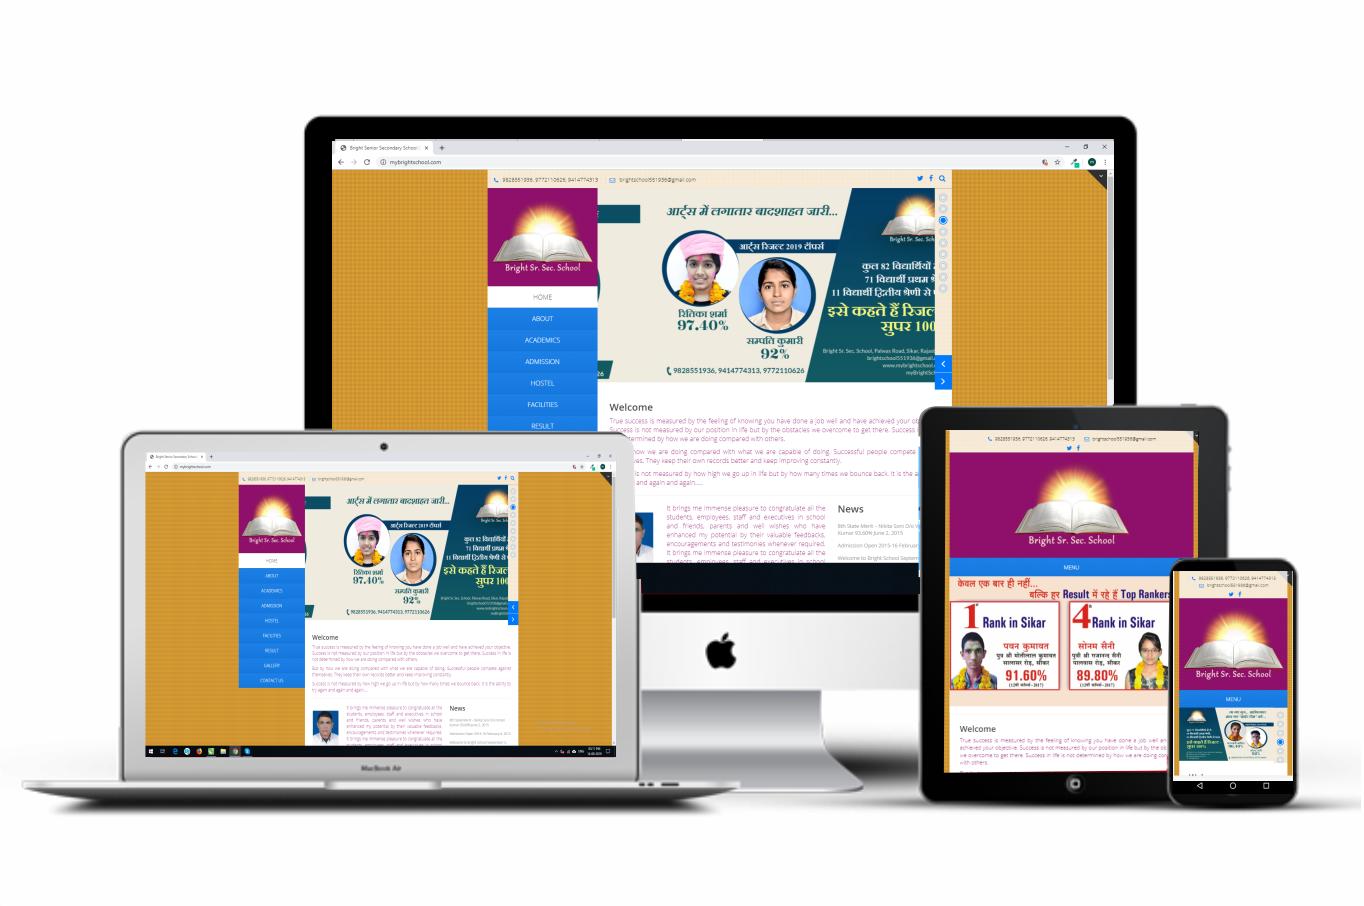 Bright Sr. Sec School App(Full Stack And Mobile Development)